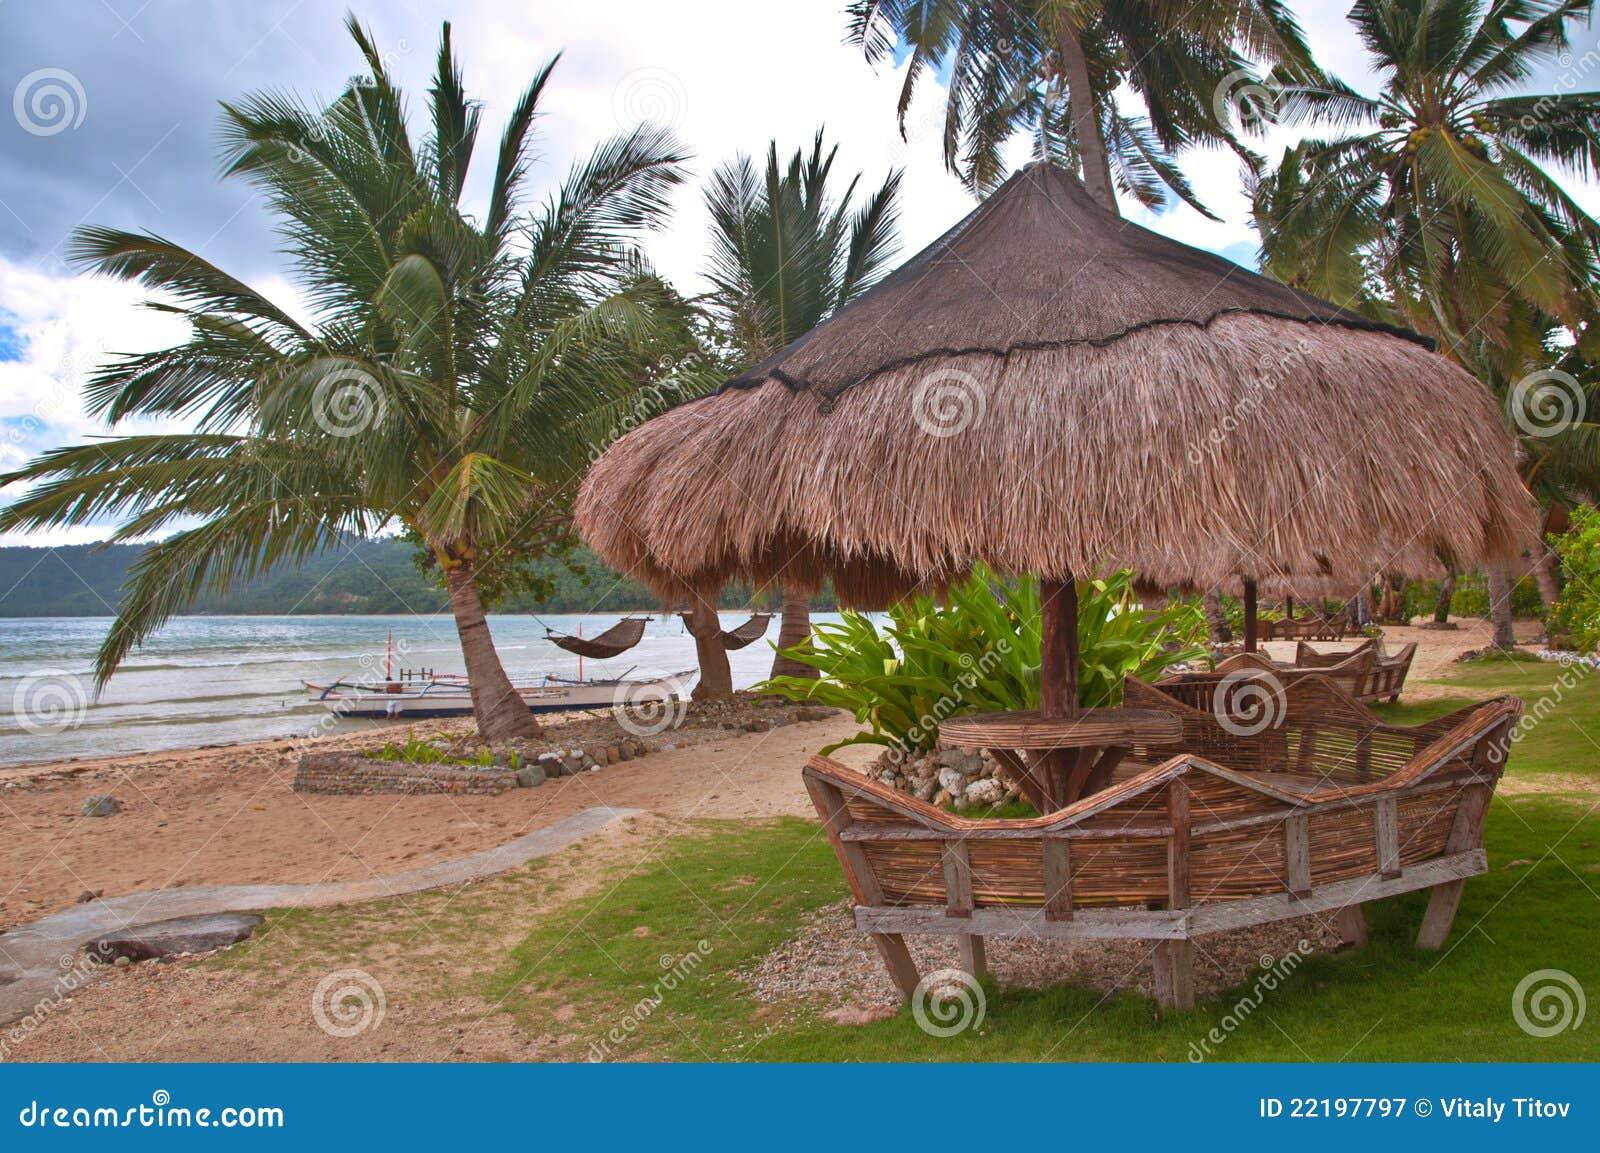 Tropical Island Beach Hut: Tropical Beach Hut Stock Image. Image Of Seascape, Island